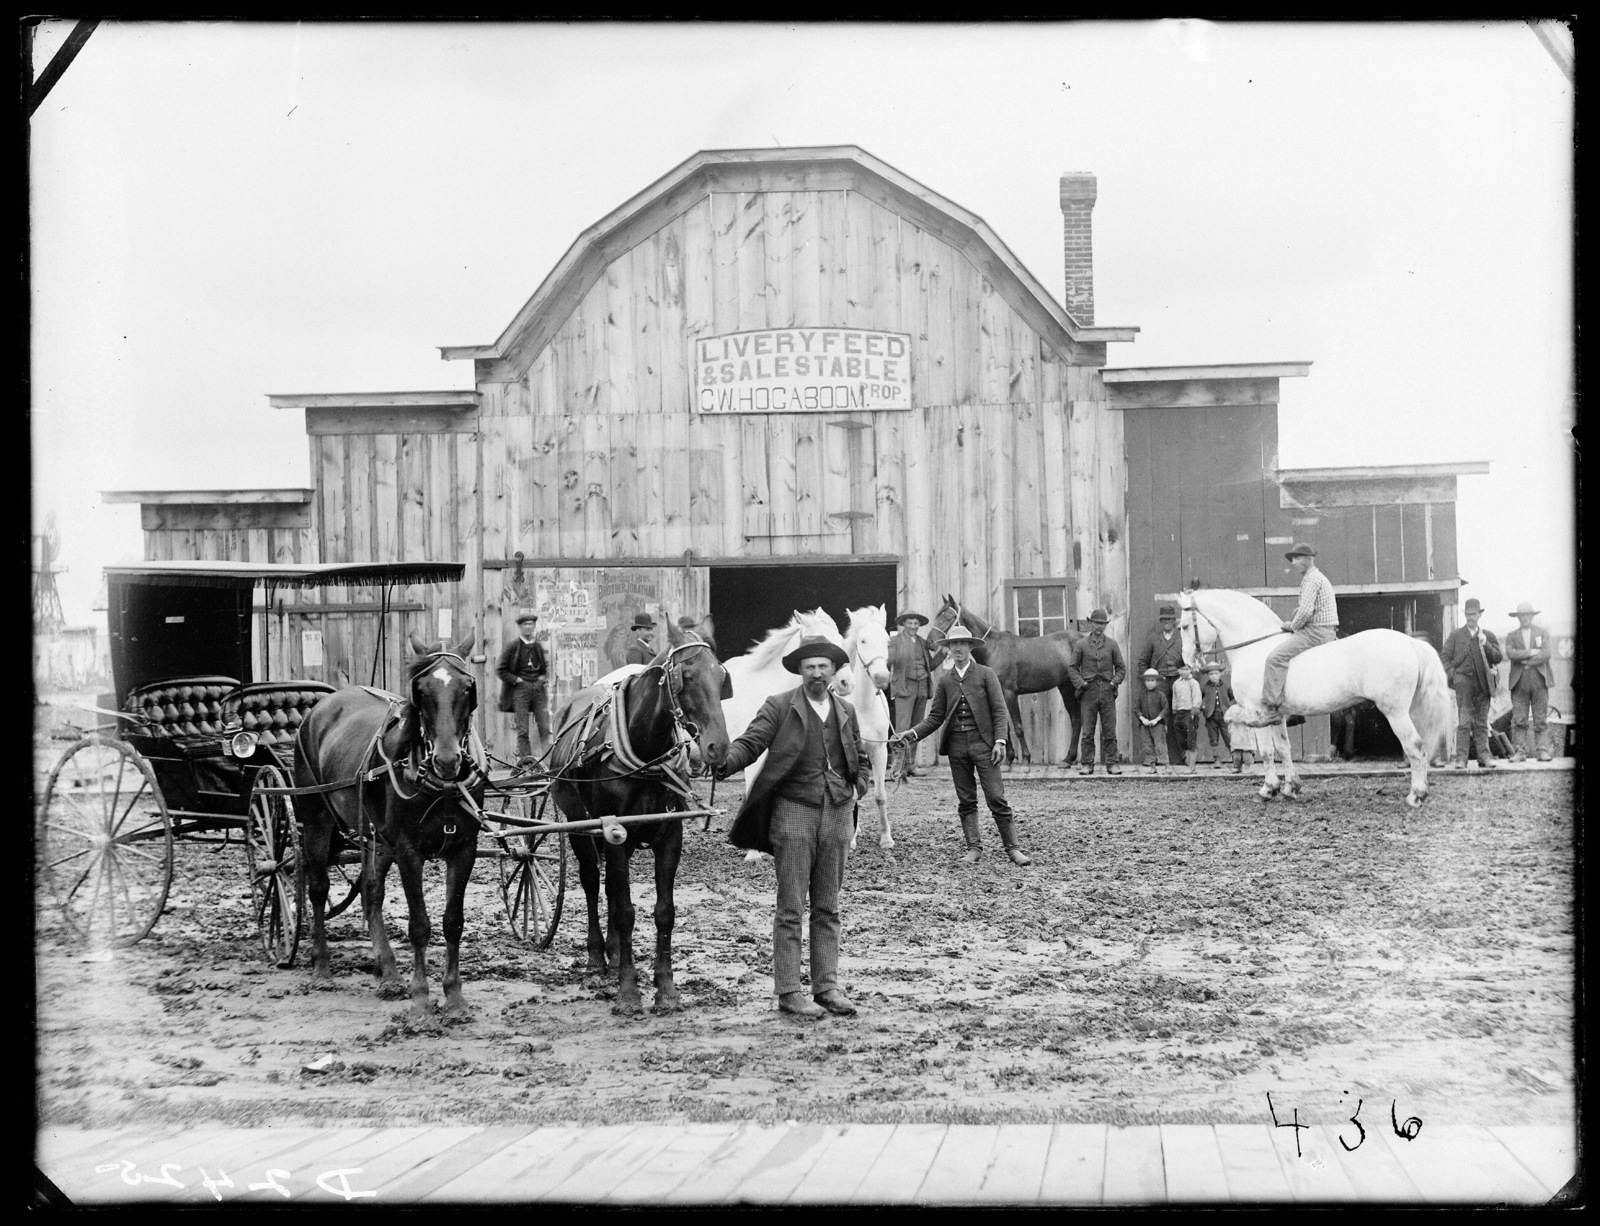 C.W. Hocaboon's Livery Feed & Sale stable, Broken Bow, Custer County, Nebraska.